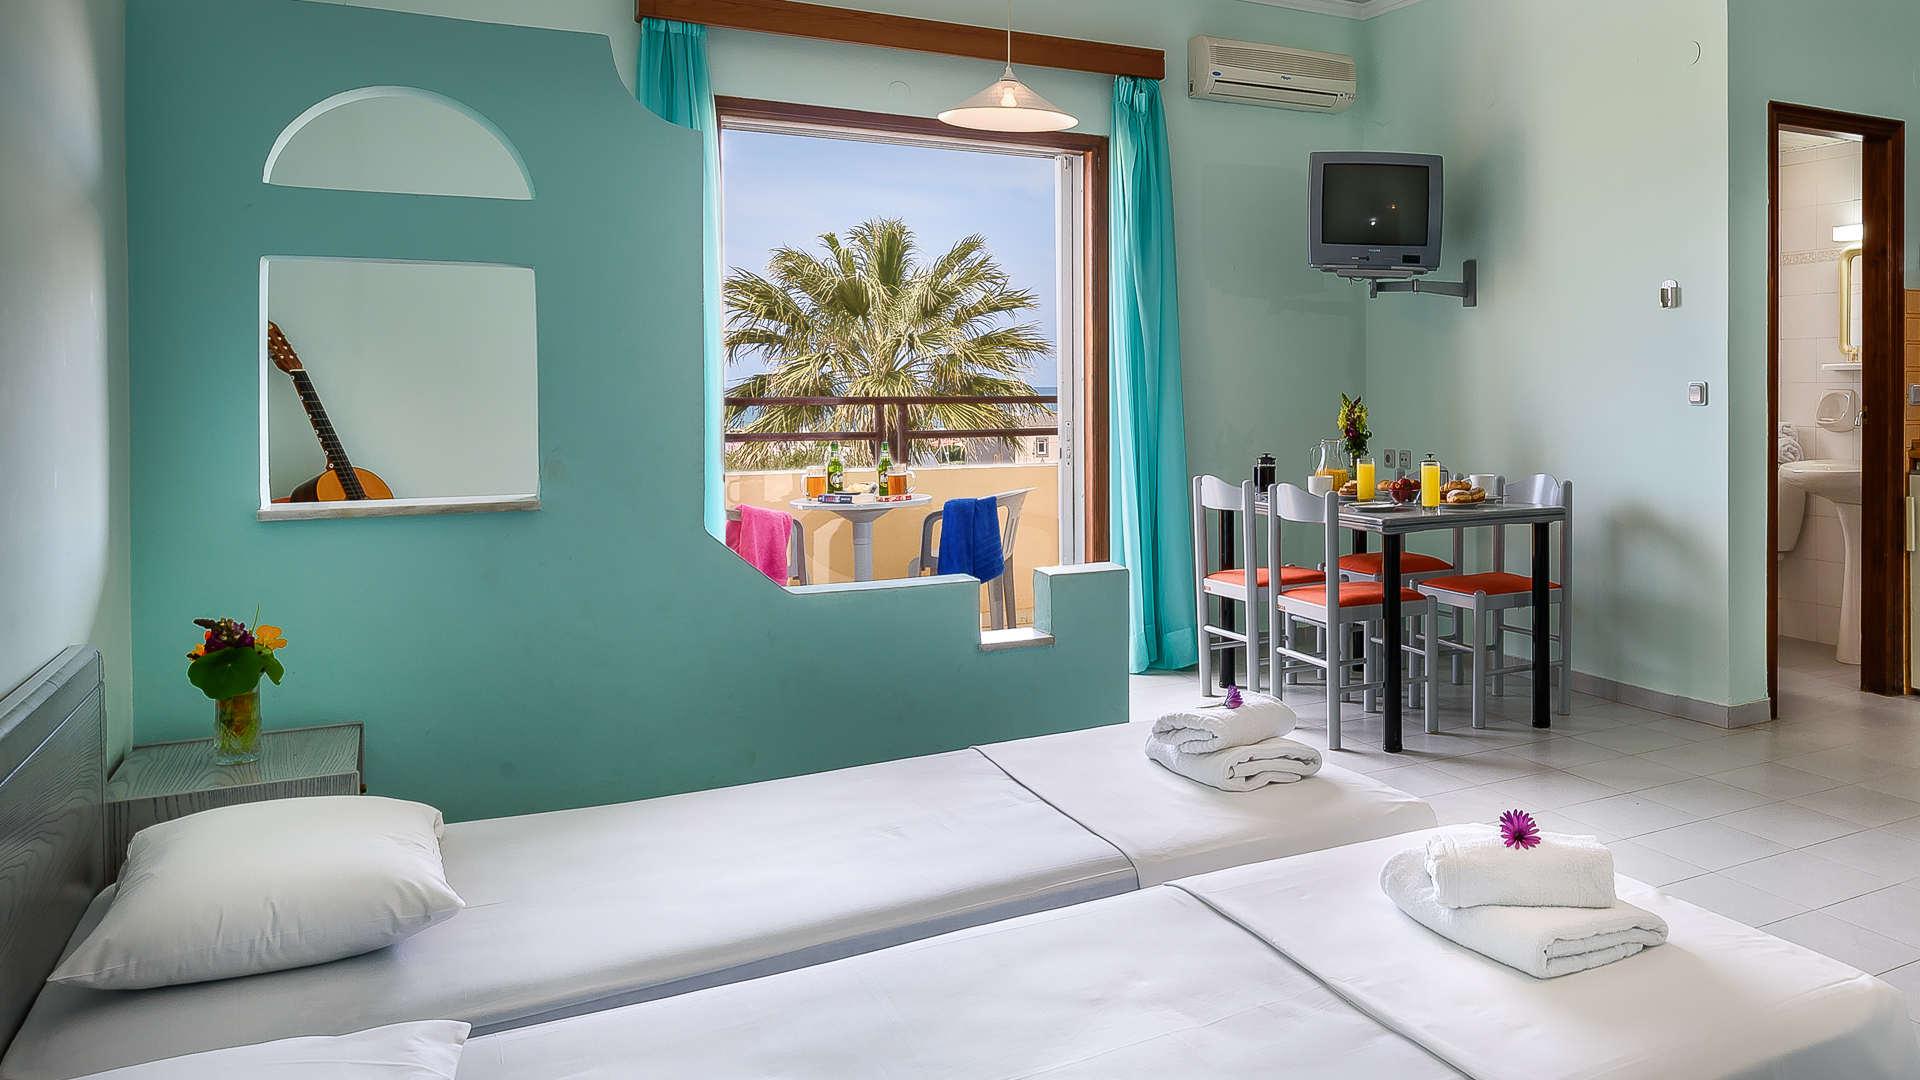 http://louladakis-apts.gr/wp-content/uploads/2017/04/louladakis_apts_large_apartment2.jpg